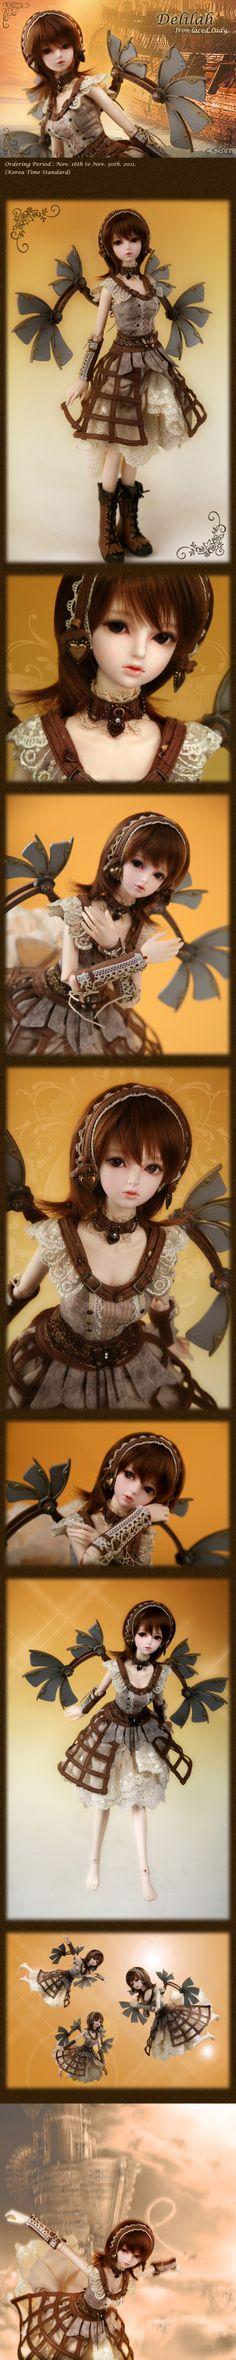 Soom Rosette School of Doll Steampunk Delilah